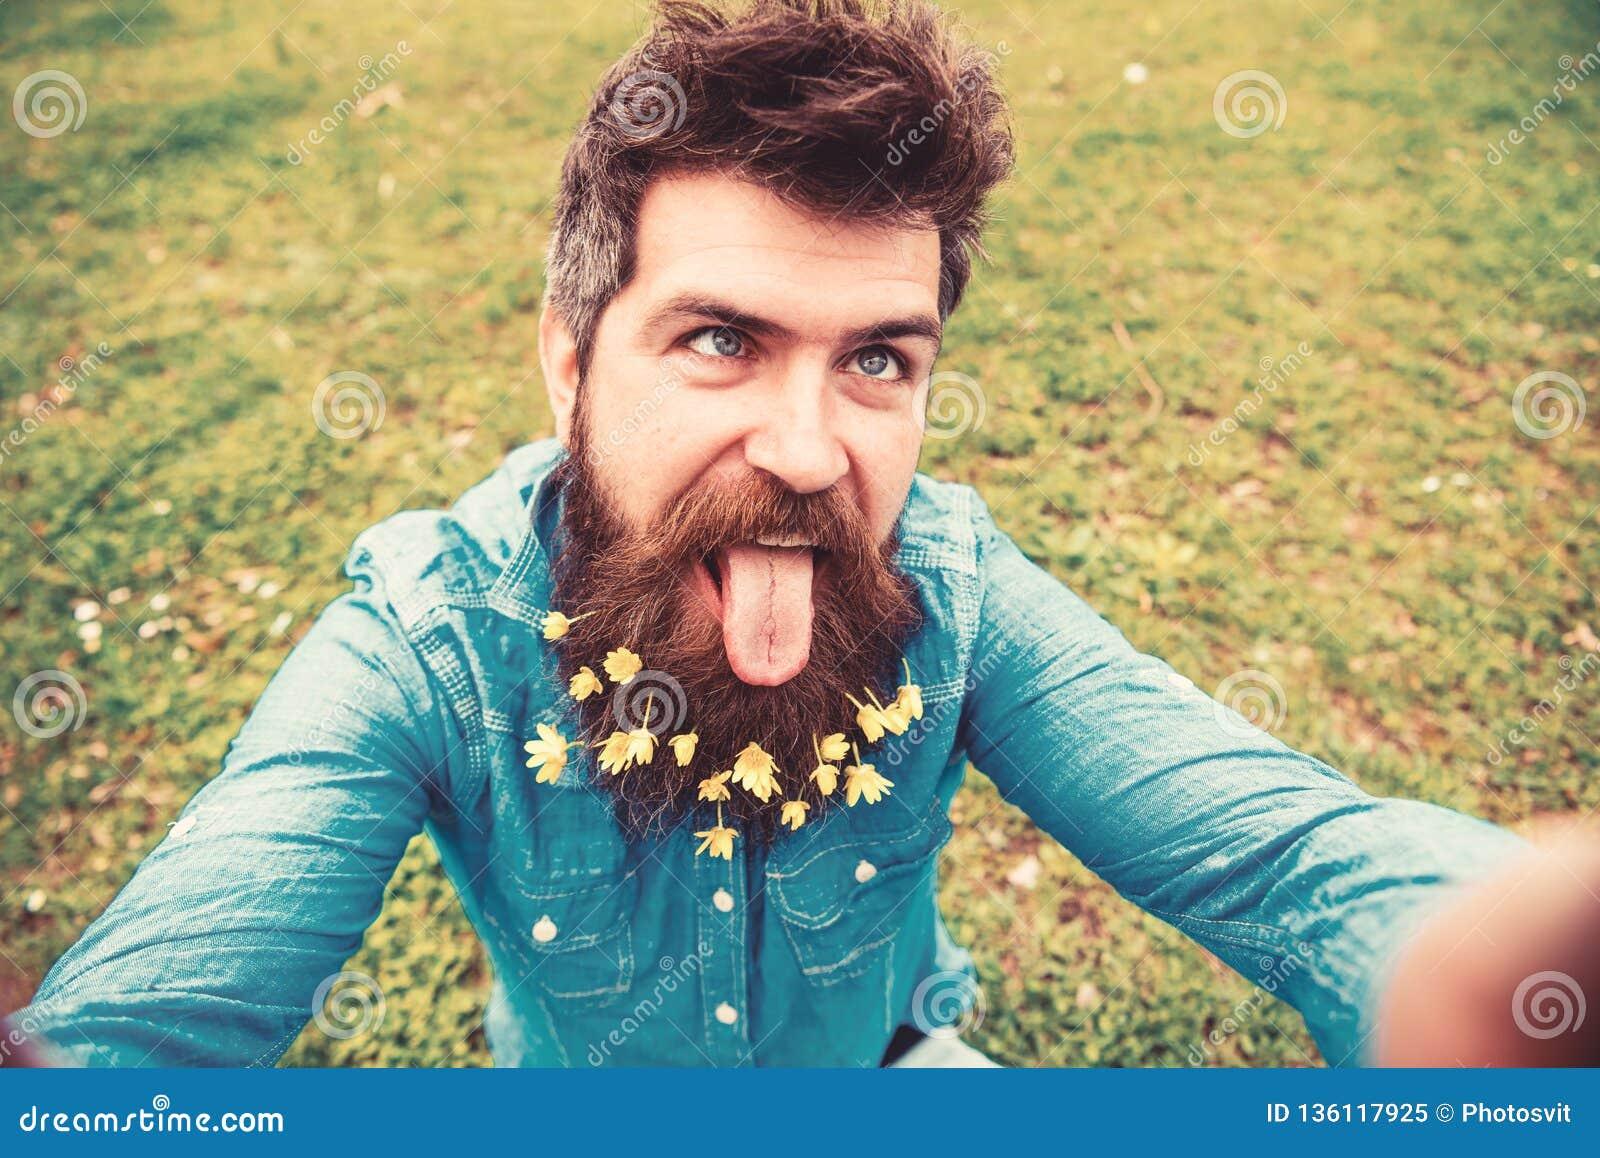 Beard guy selfie with This Beard